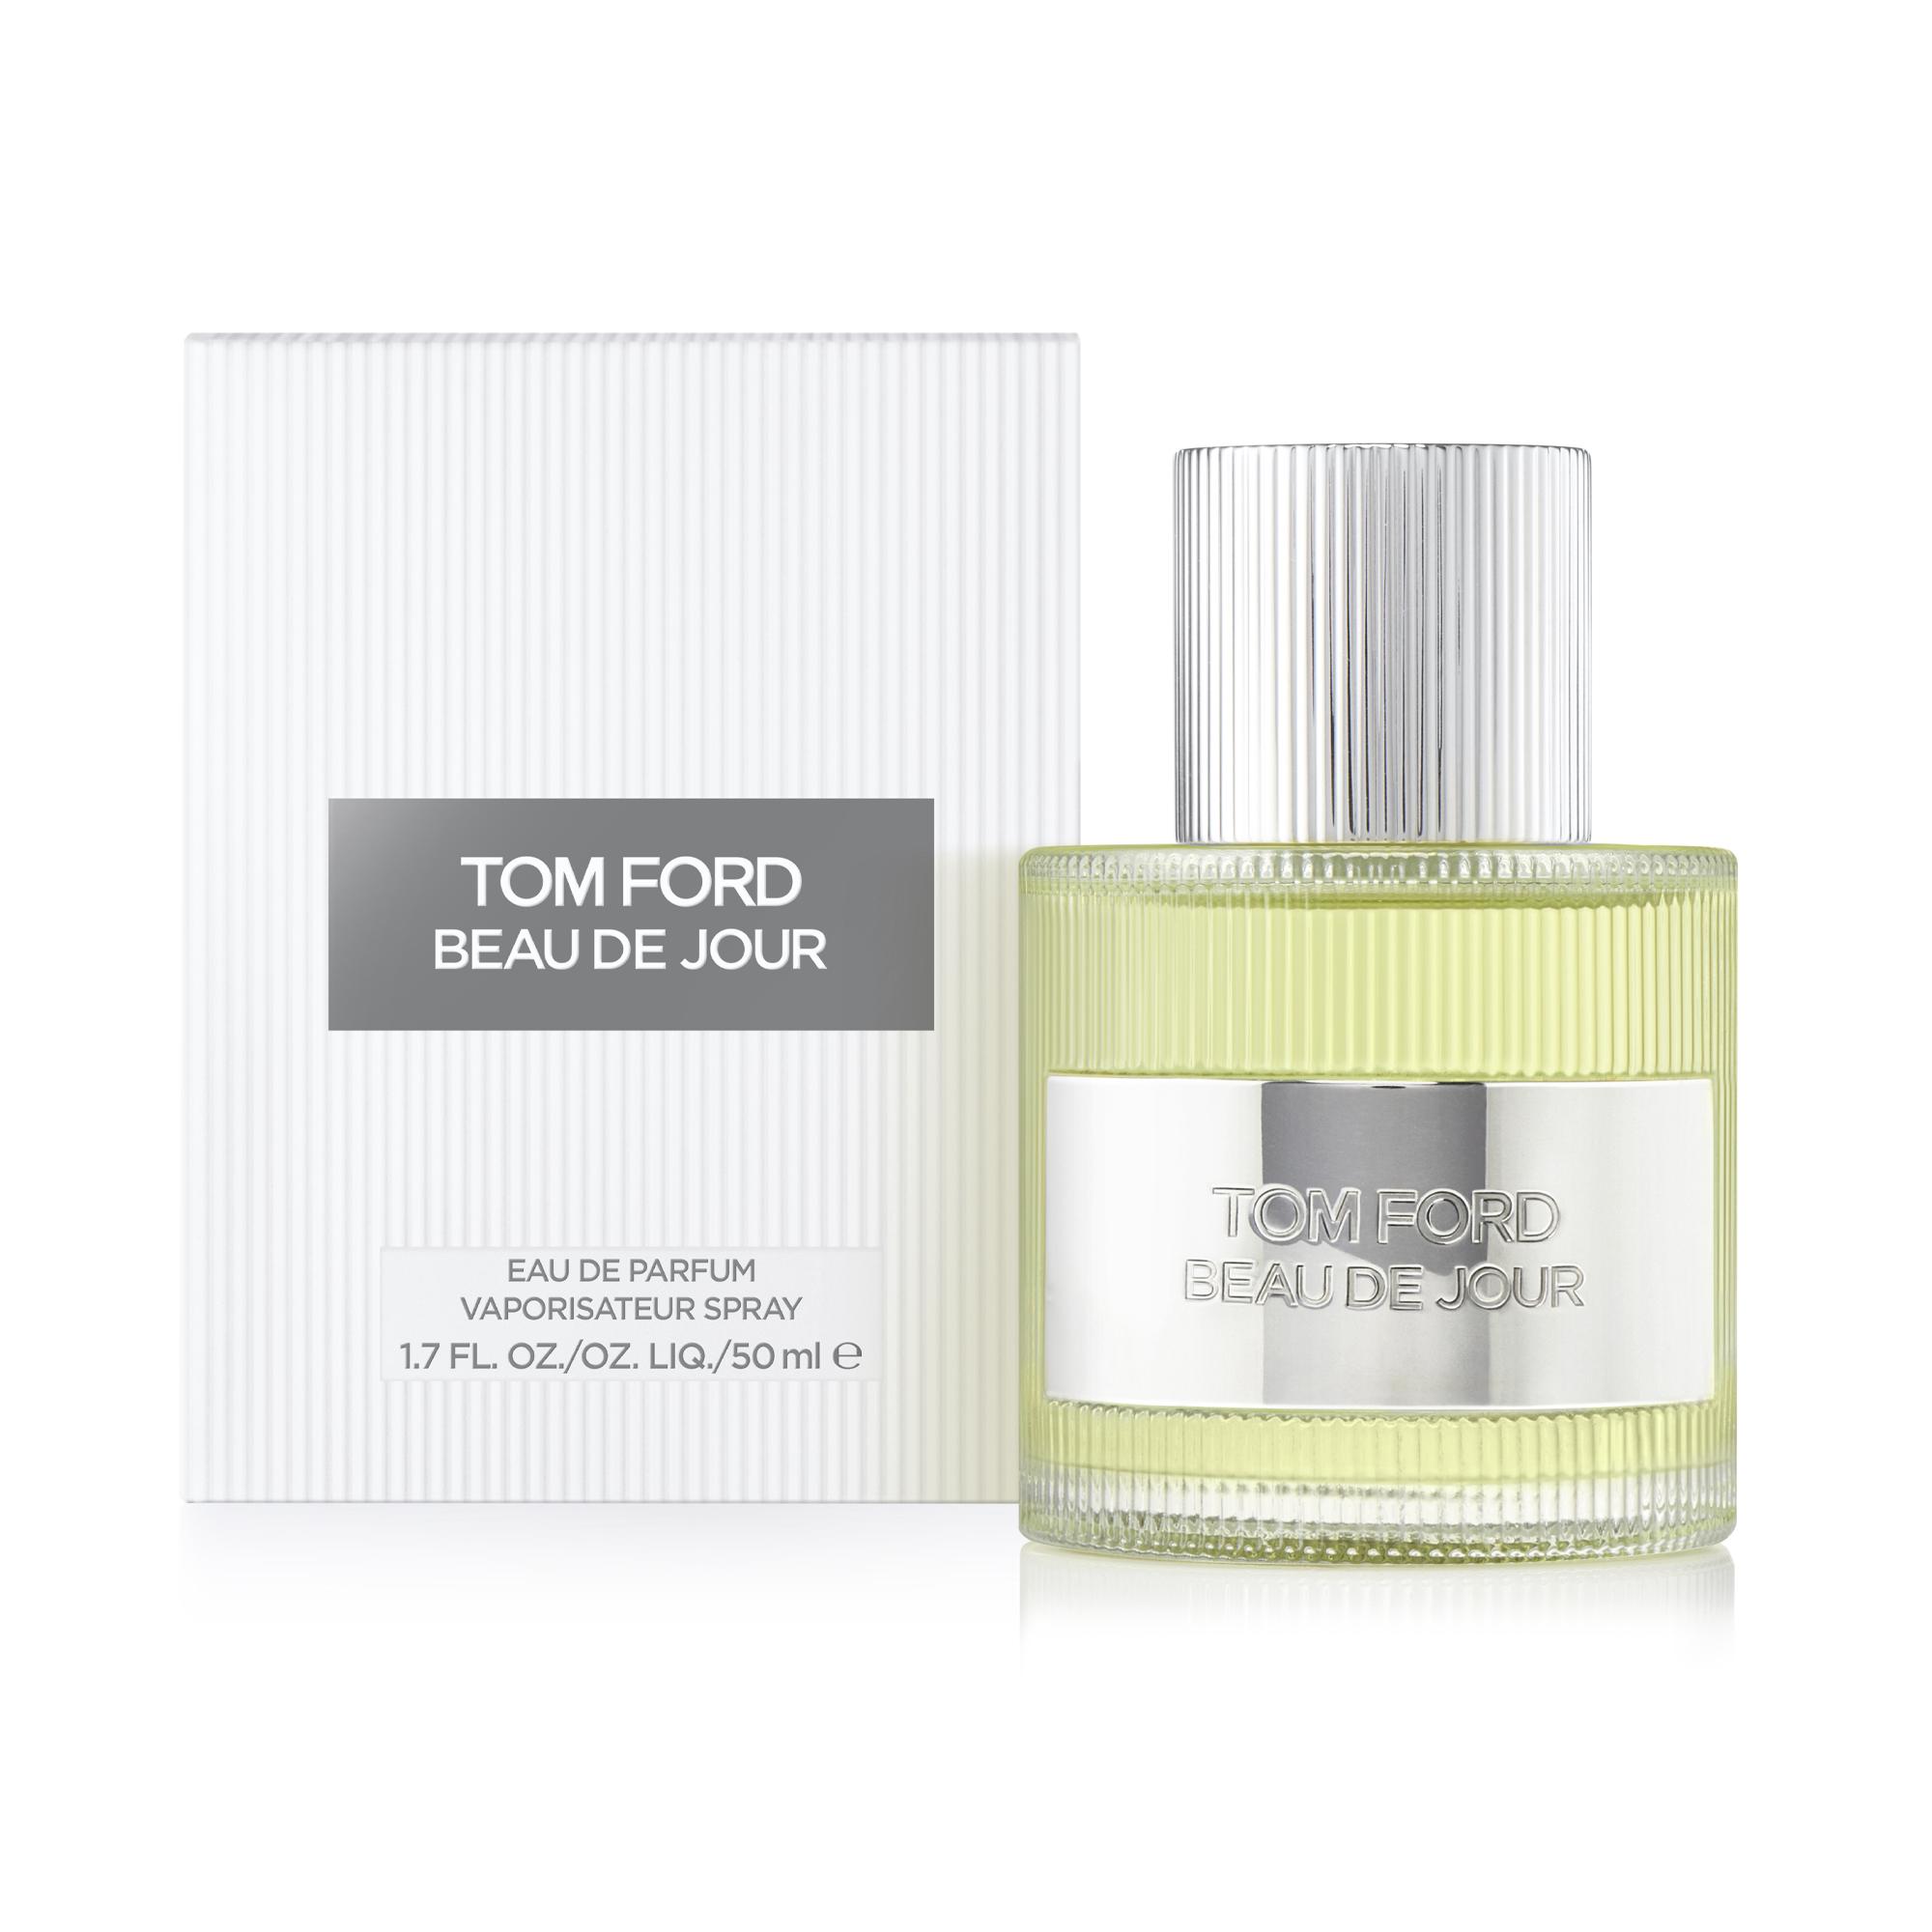 Tom Ford Beau De Jour EDP, 50 ml